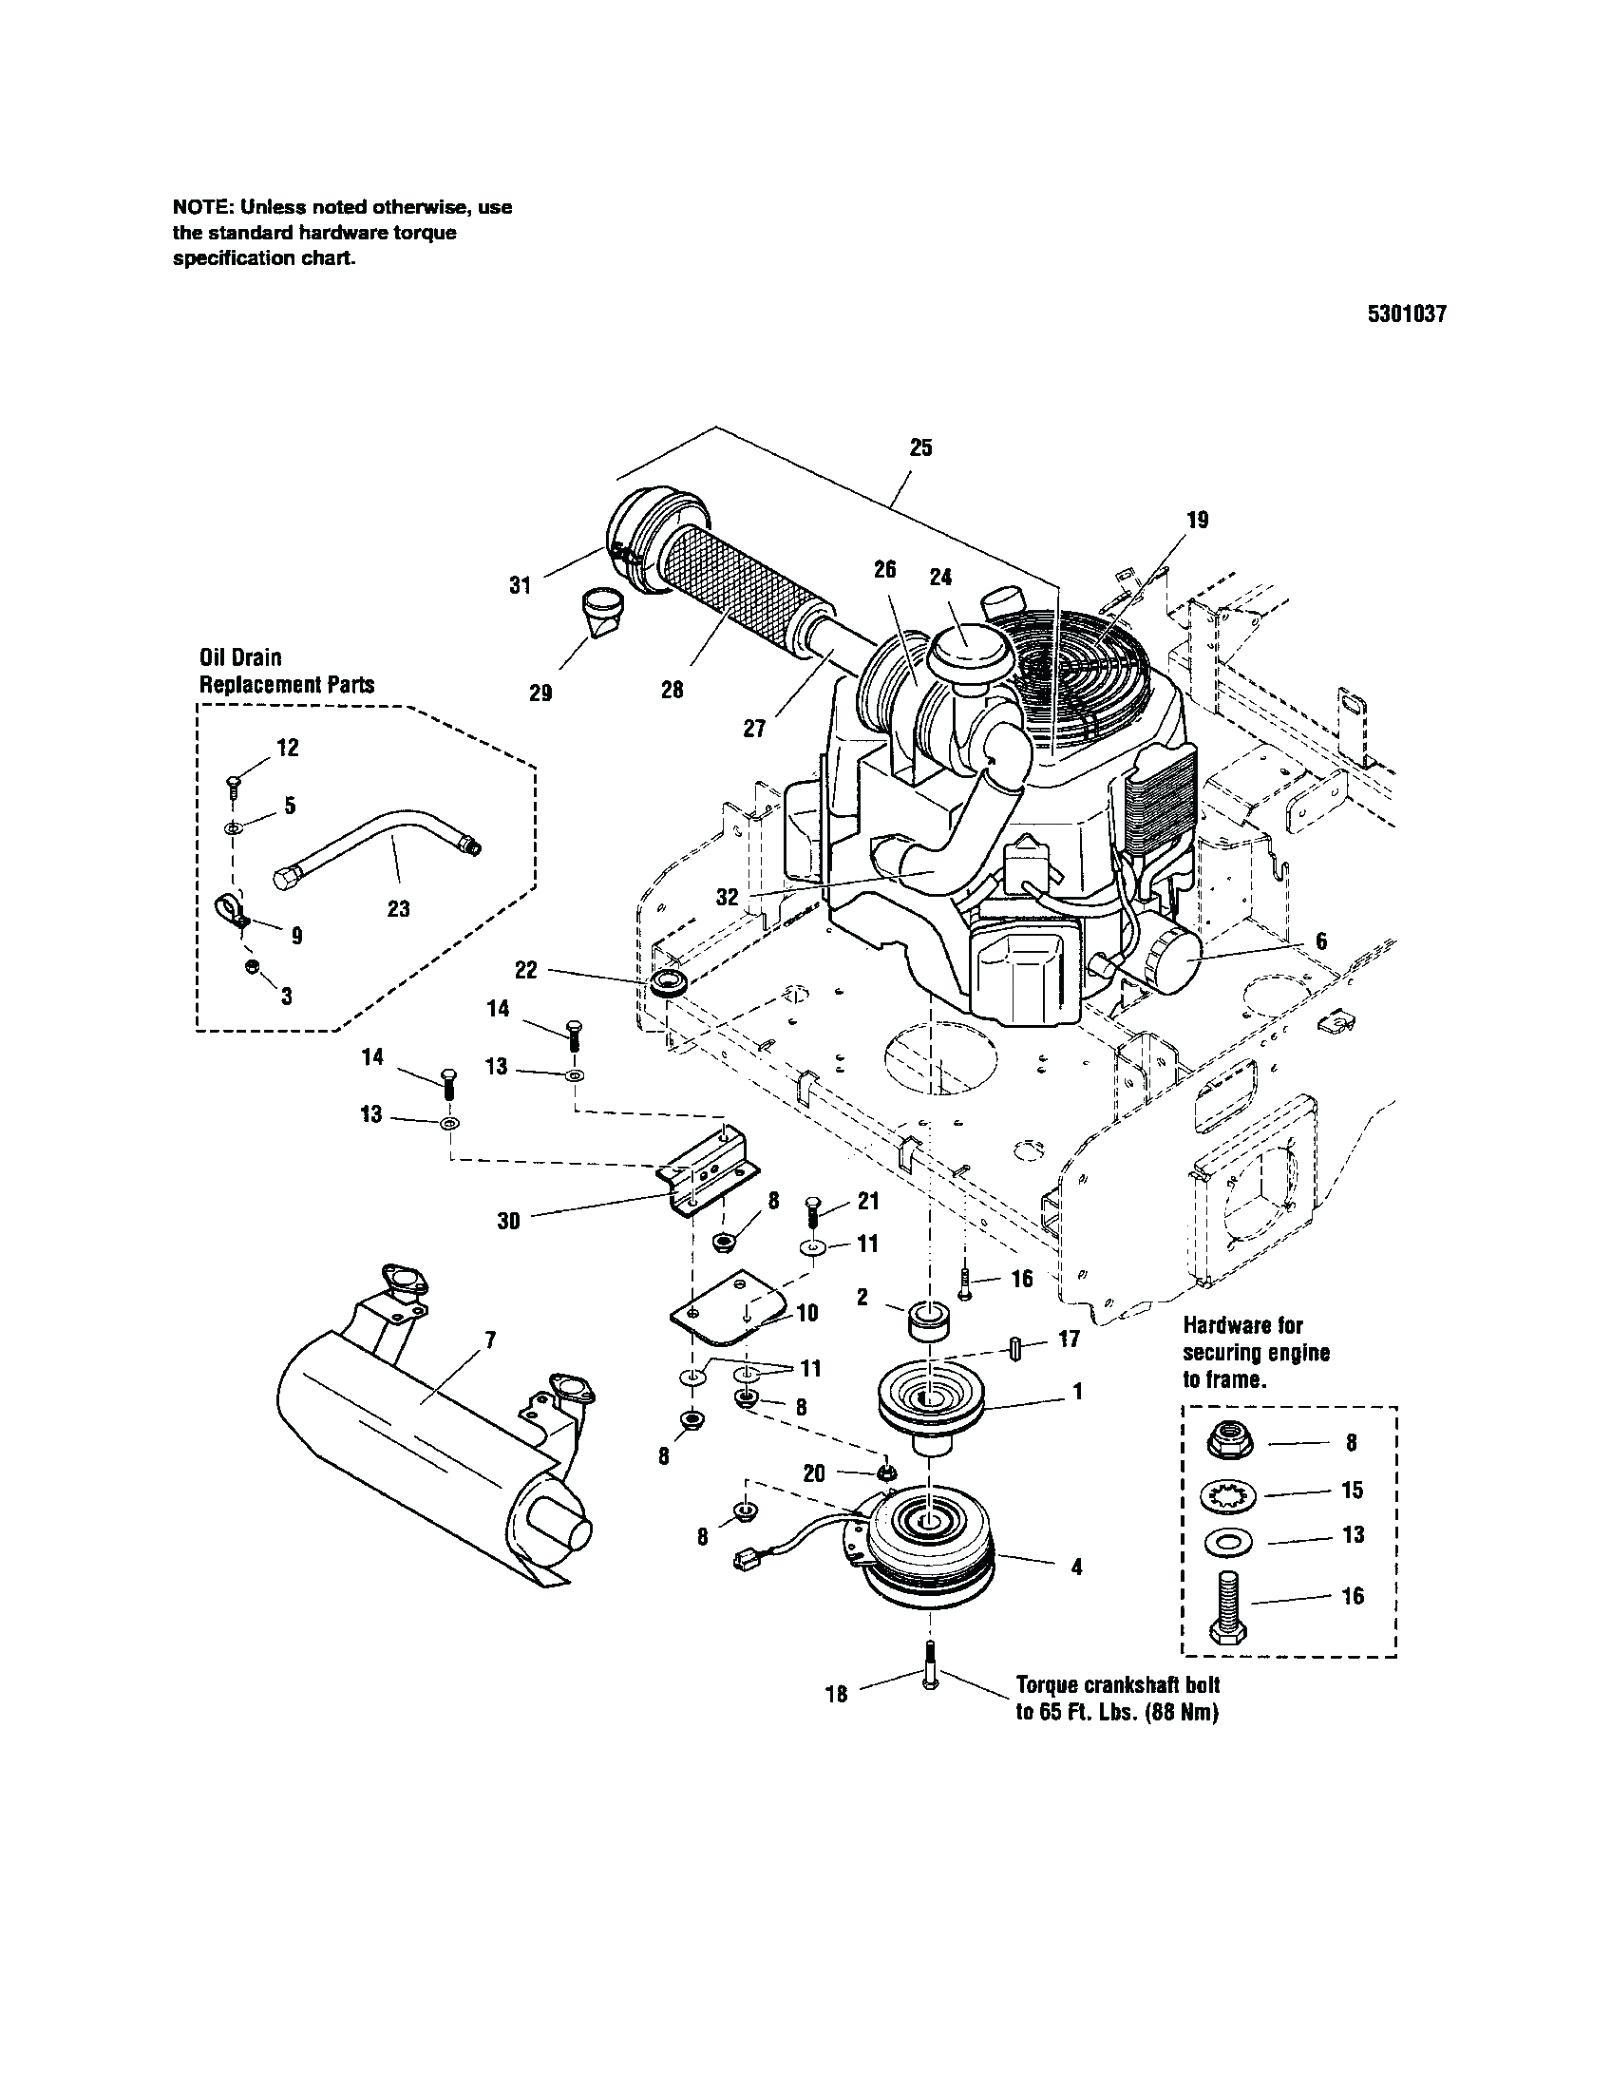 Amazing Honda 24 Hp Wiring Diagram Get Free Image About Wiring Diagram Wiring Cloud Icalpermsplehendilmohammedshrineorg